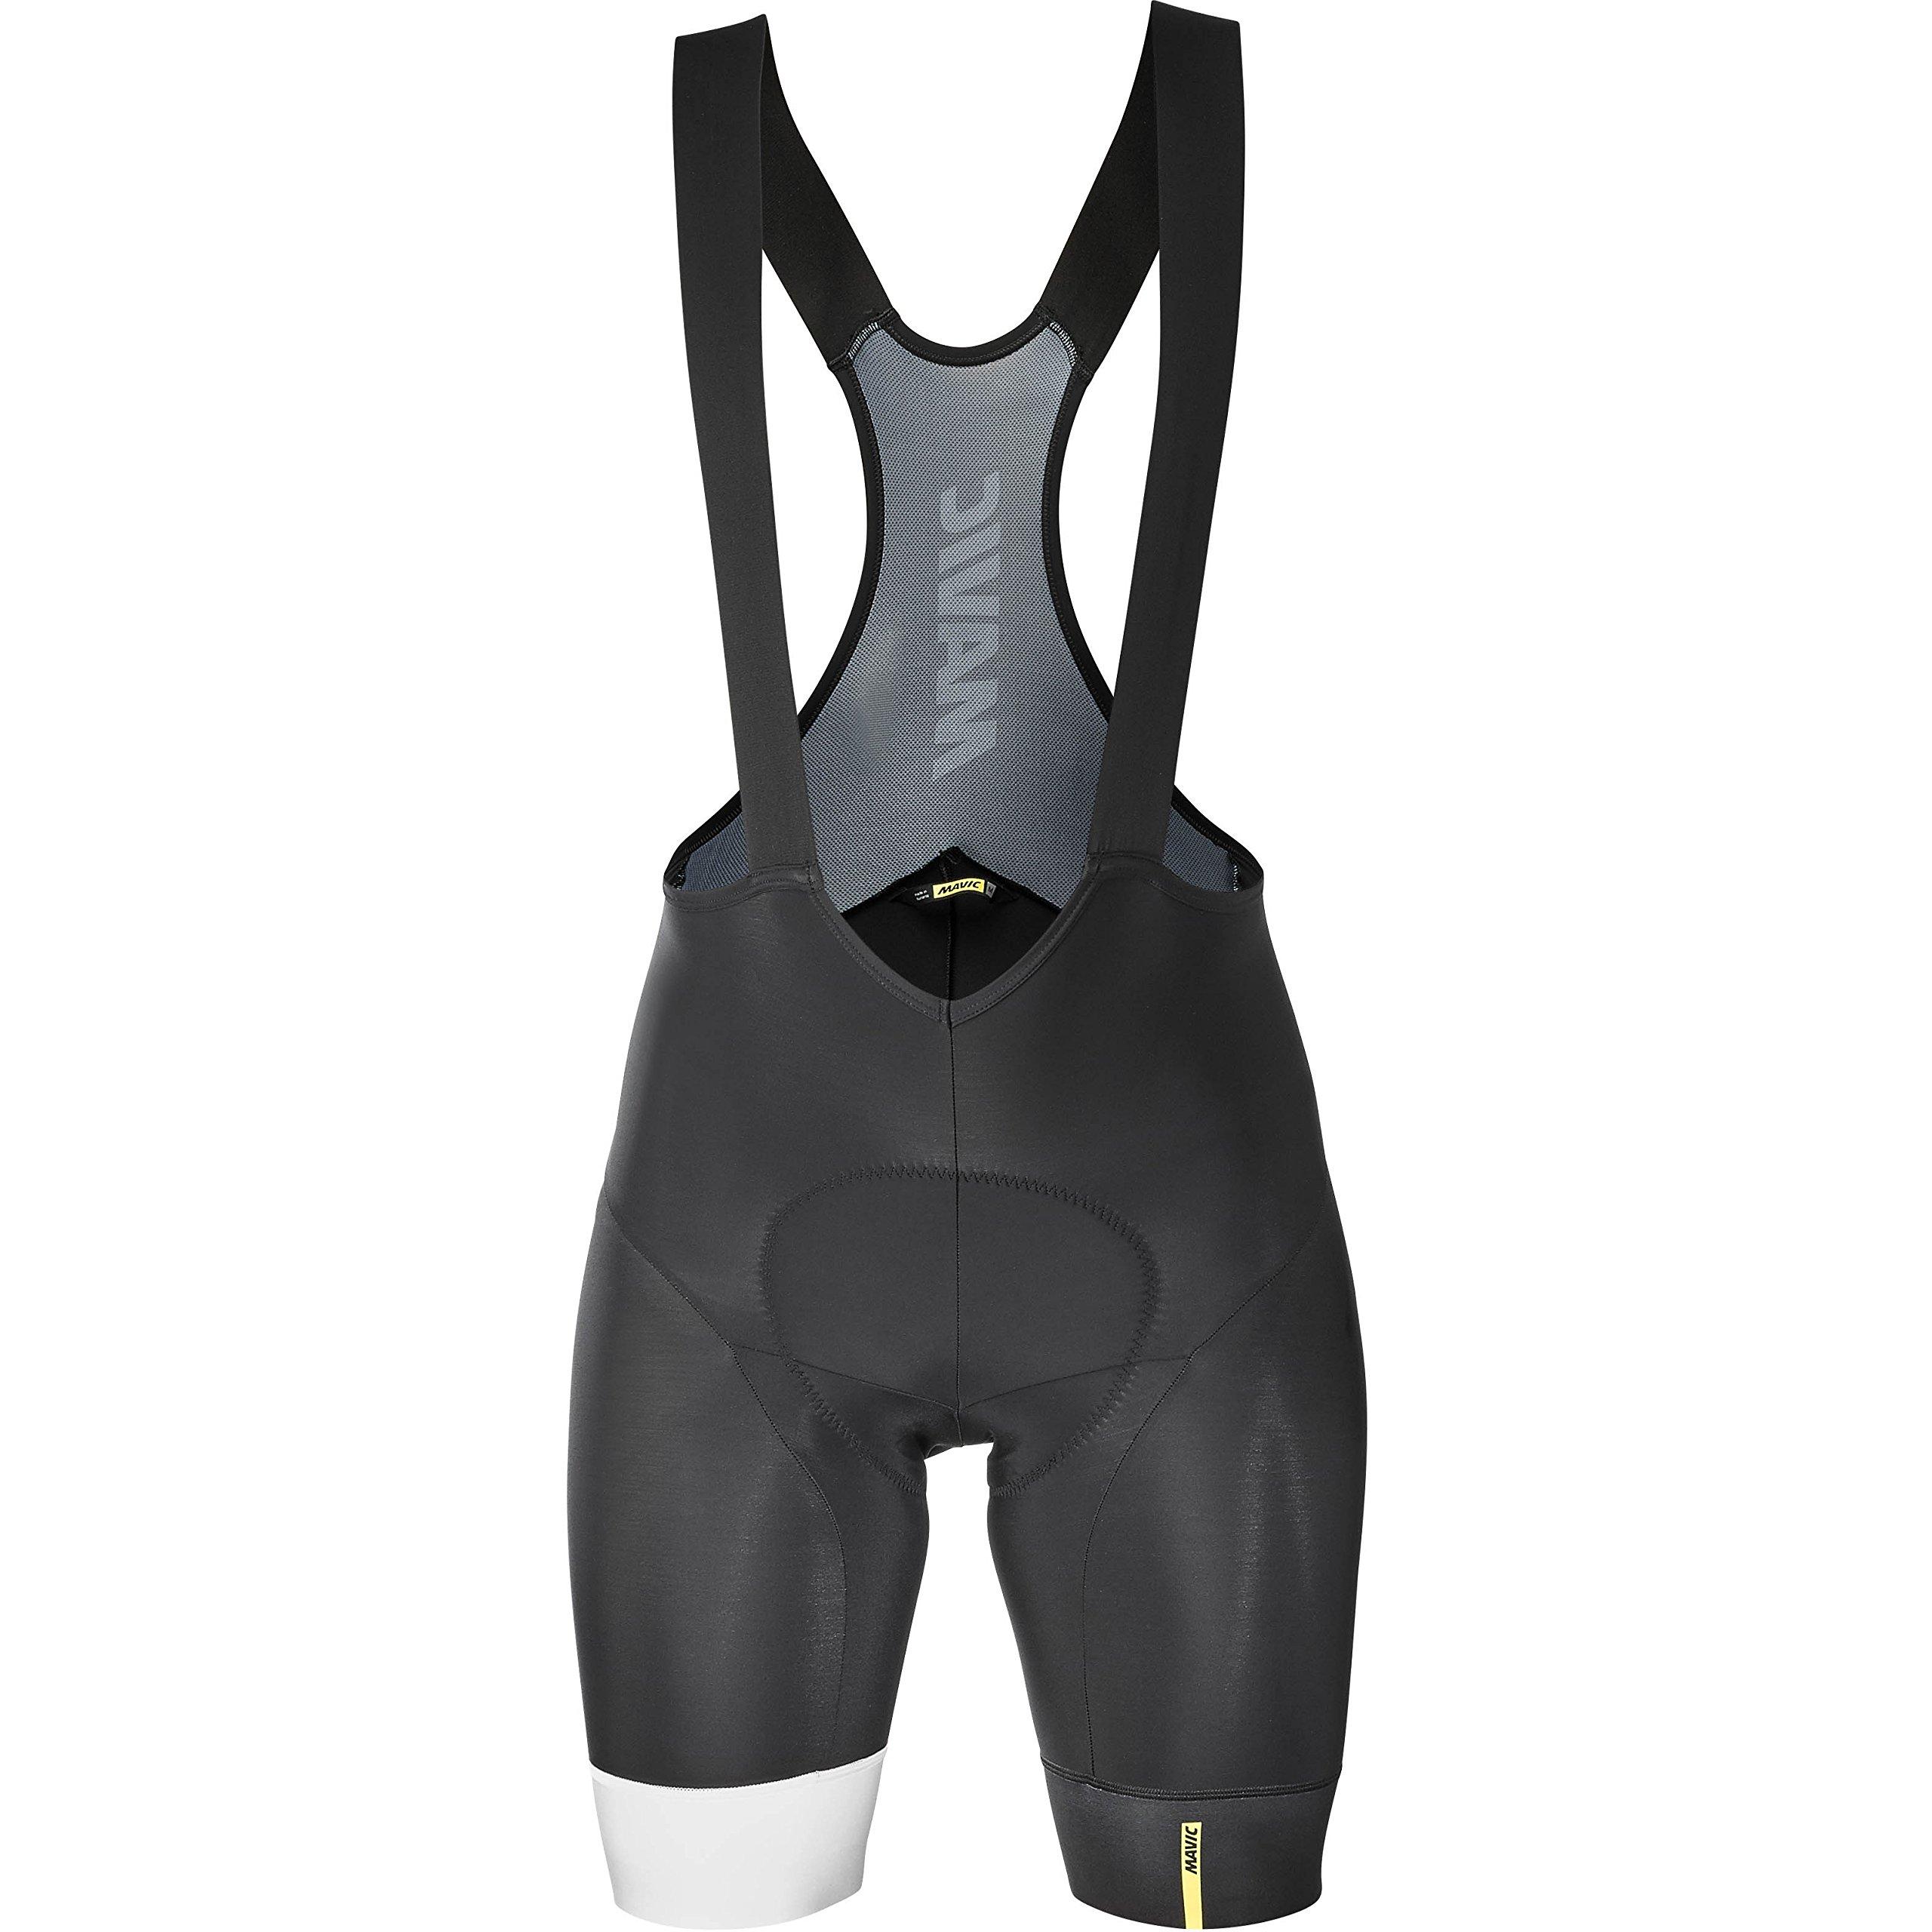 Mavic Essential Bib Short - Men's Black/White, XL